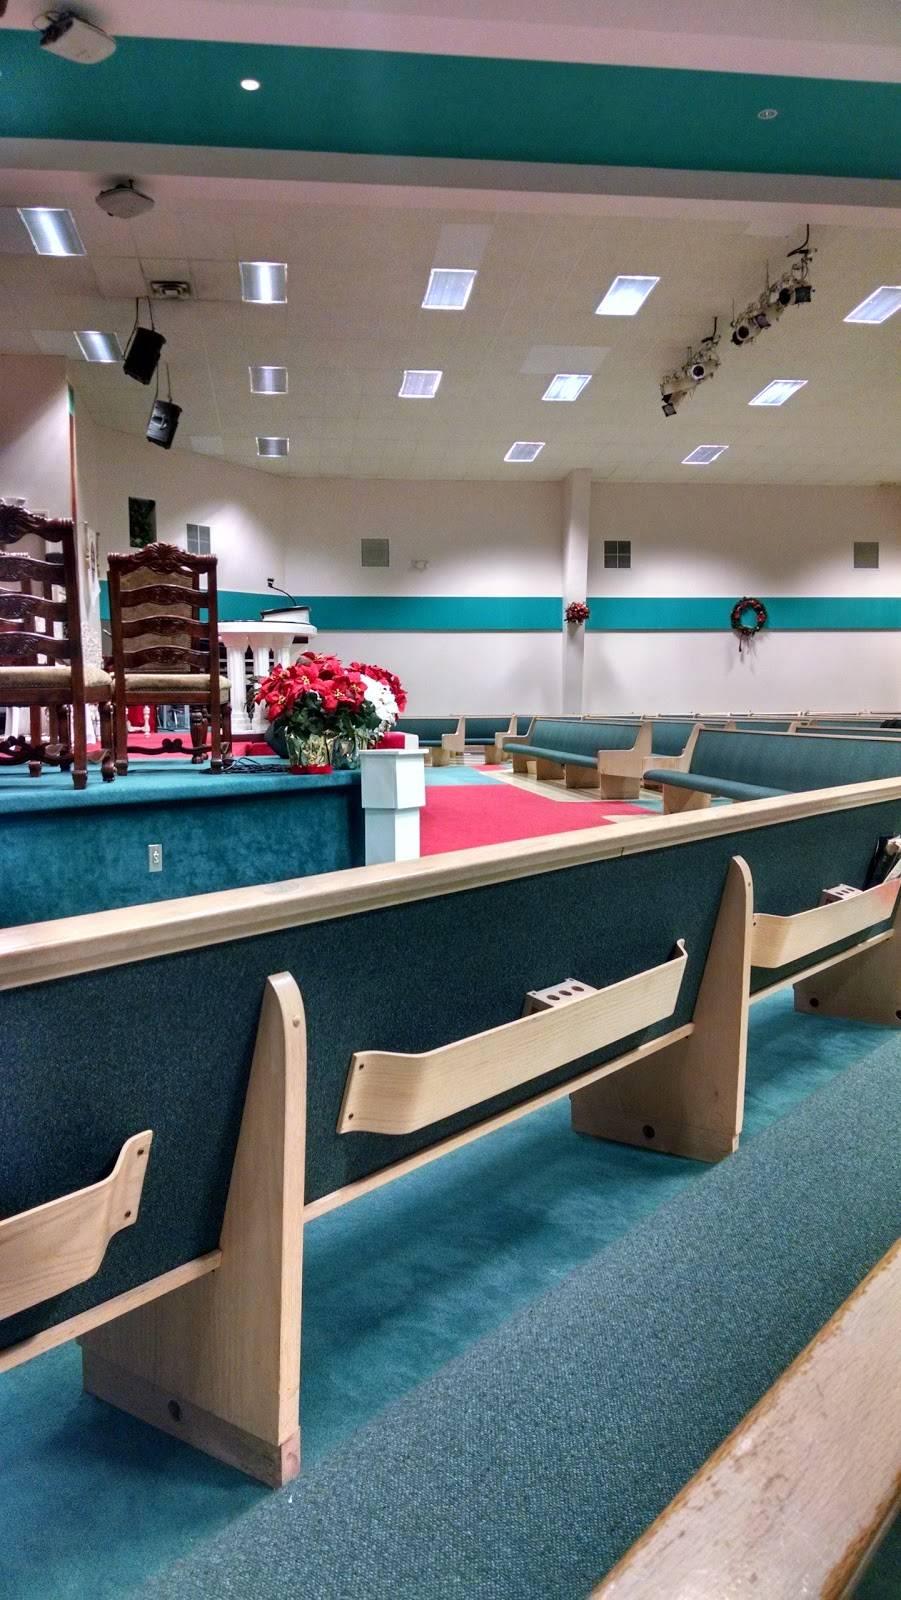 Mount Hermon Missionary Baptist Church - church  | Photo 3 of 9 | Address: 2283 Sunbury Rd, Columbus, OH 43219, USA | Phone: (614) 471-1133